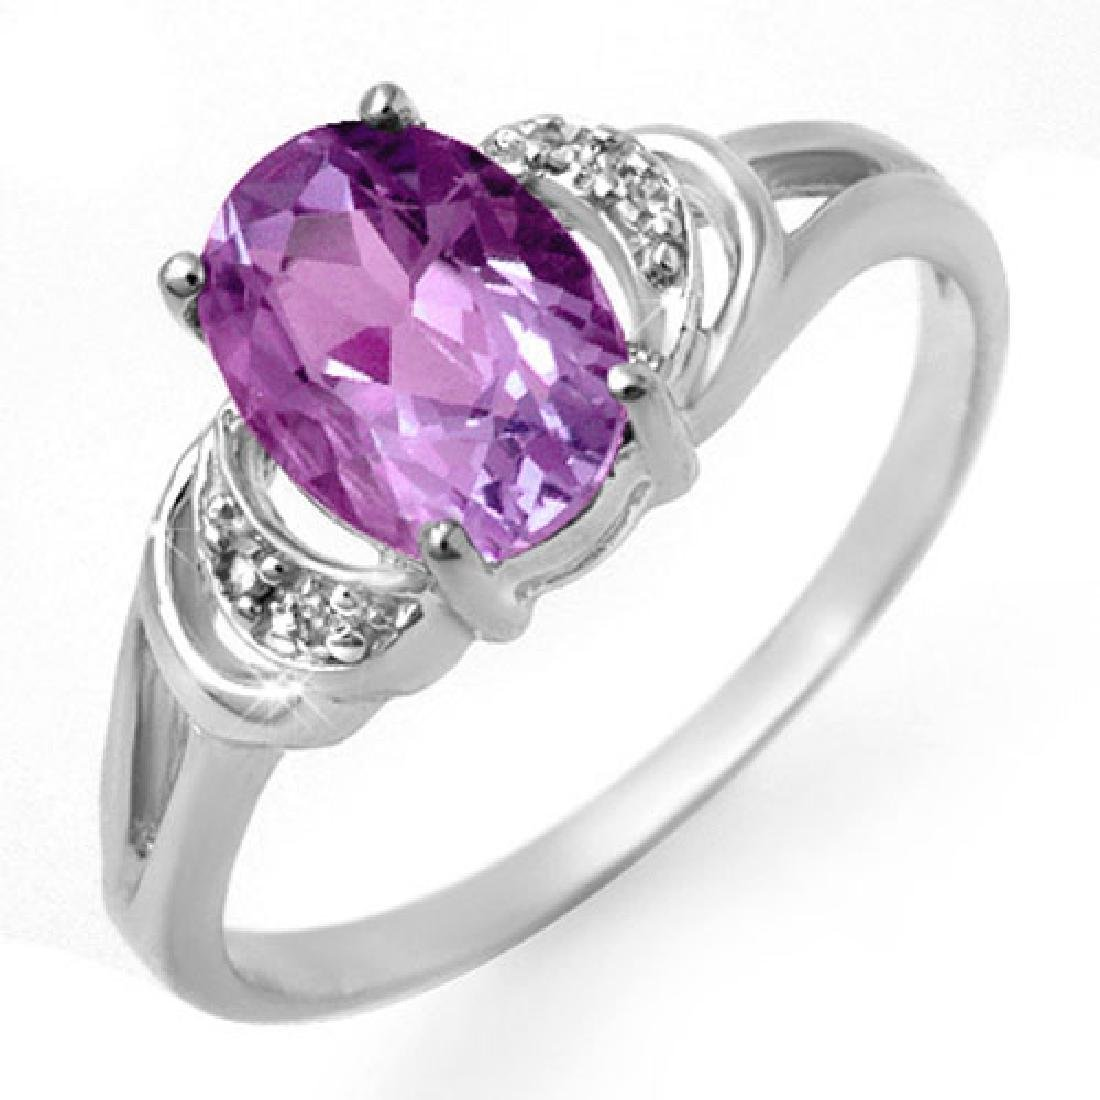 1.05 CTW Amethyst & Diamond Ring 10K White Gold